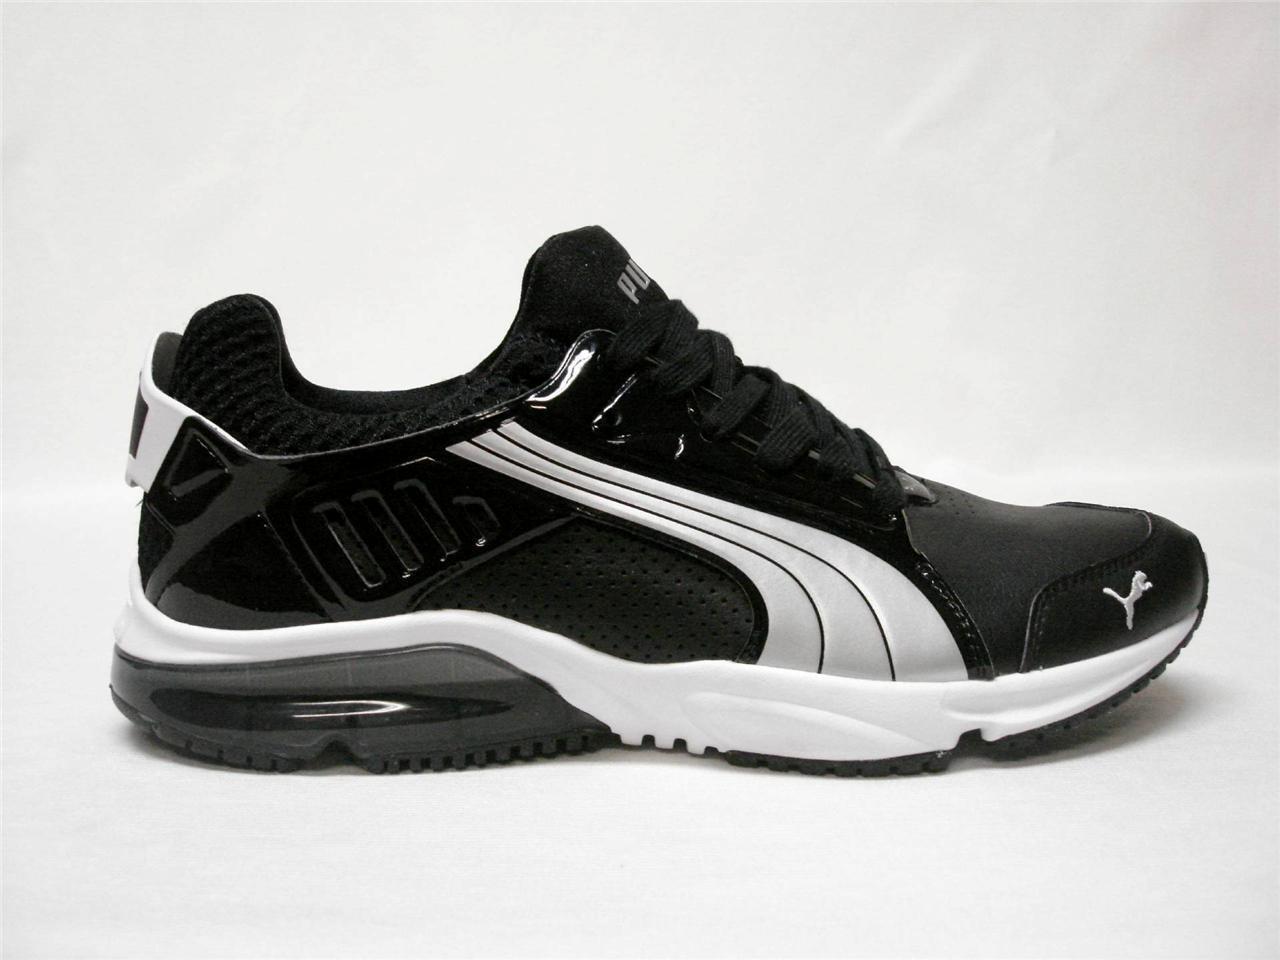 Nuevo En Caja PUMA POWERTECH BLAZE META Hombres Zapatos Plata  ~ Negro ~ Plata Zapatos ~ ~ 13 ~ Bonito Zapato's d969f0